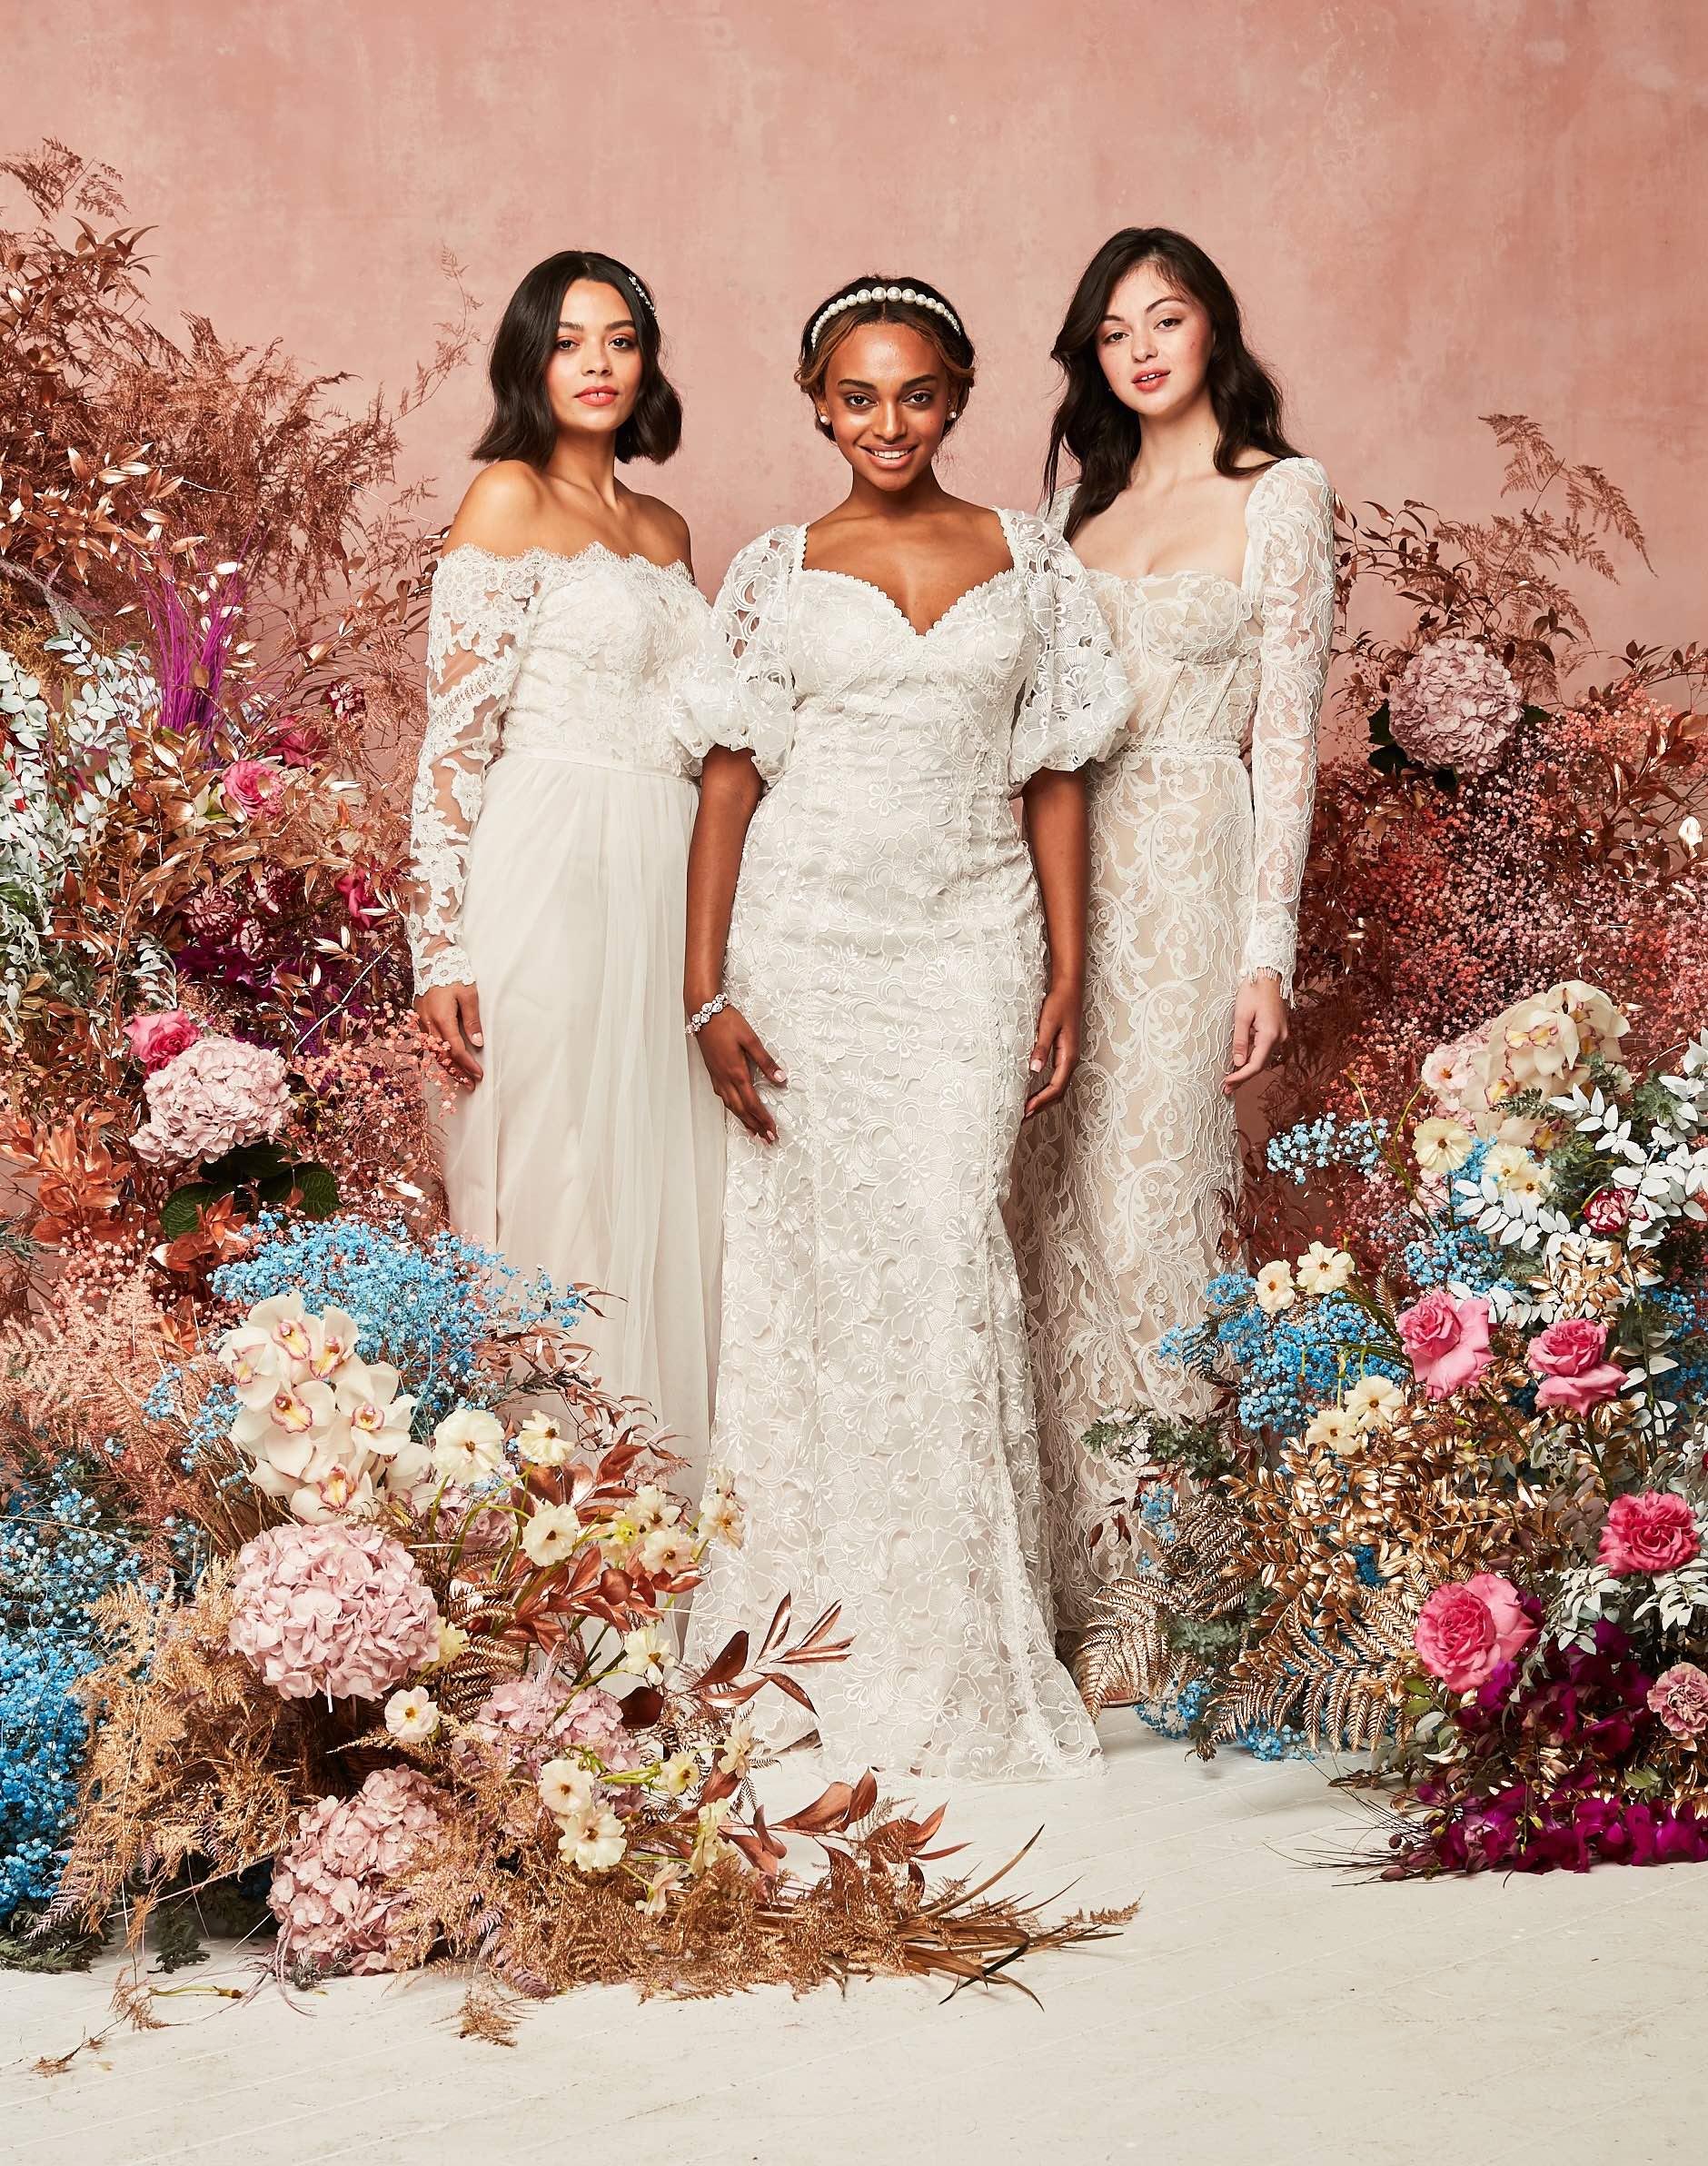 Statement Sleeve Bridal Grouping